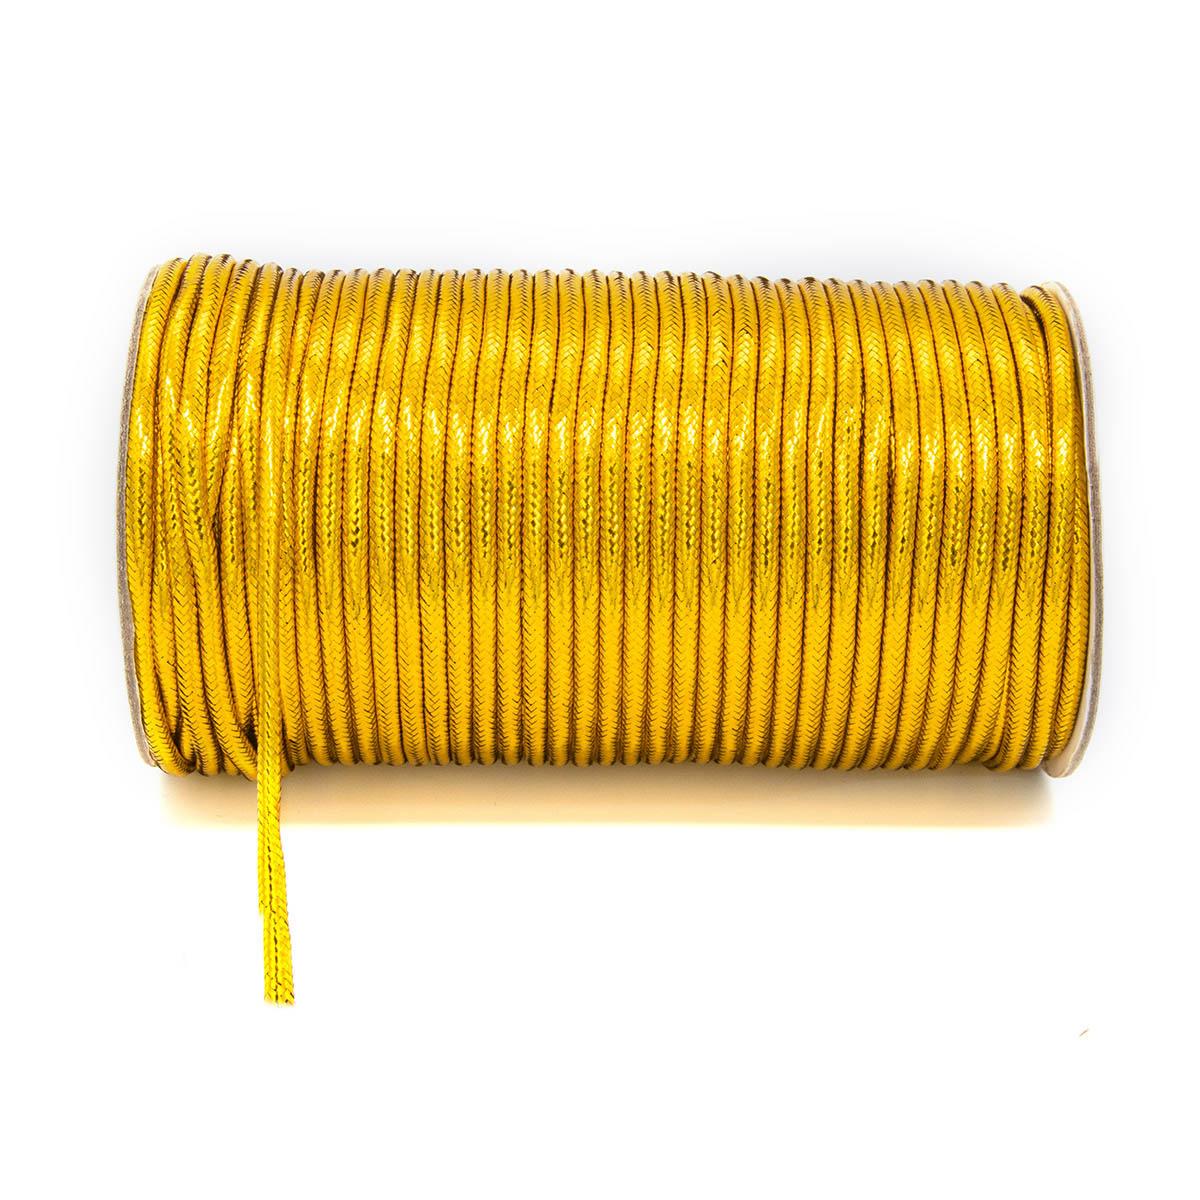 0371-1011 Шнур металлизированный (люрекс), 3 мм*50 м